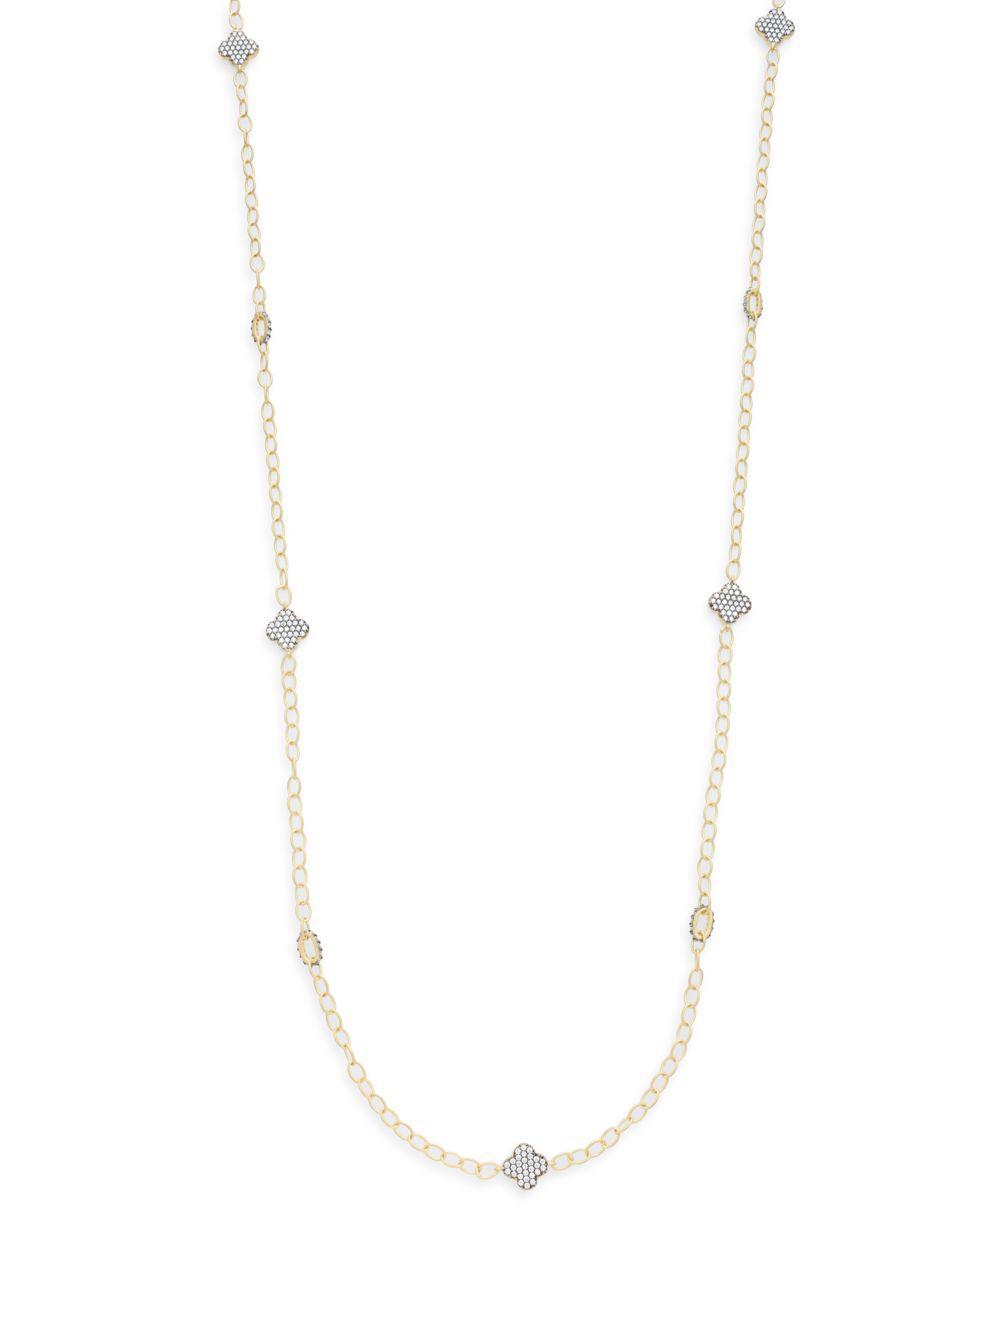 Freida Rothman Pave Crystal Clover Fringe Necklace hyDSmLiGp